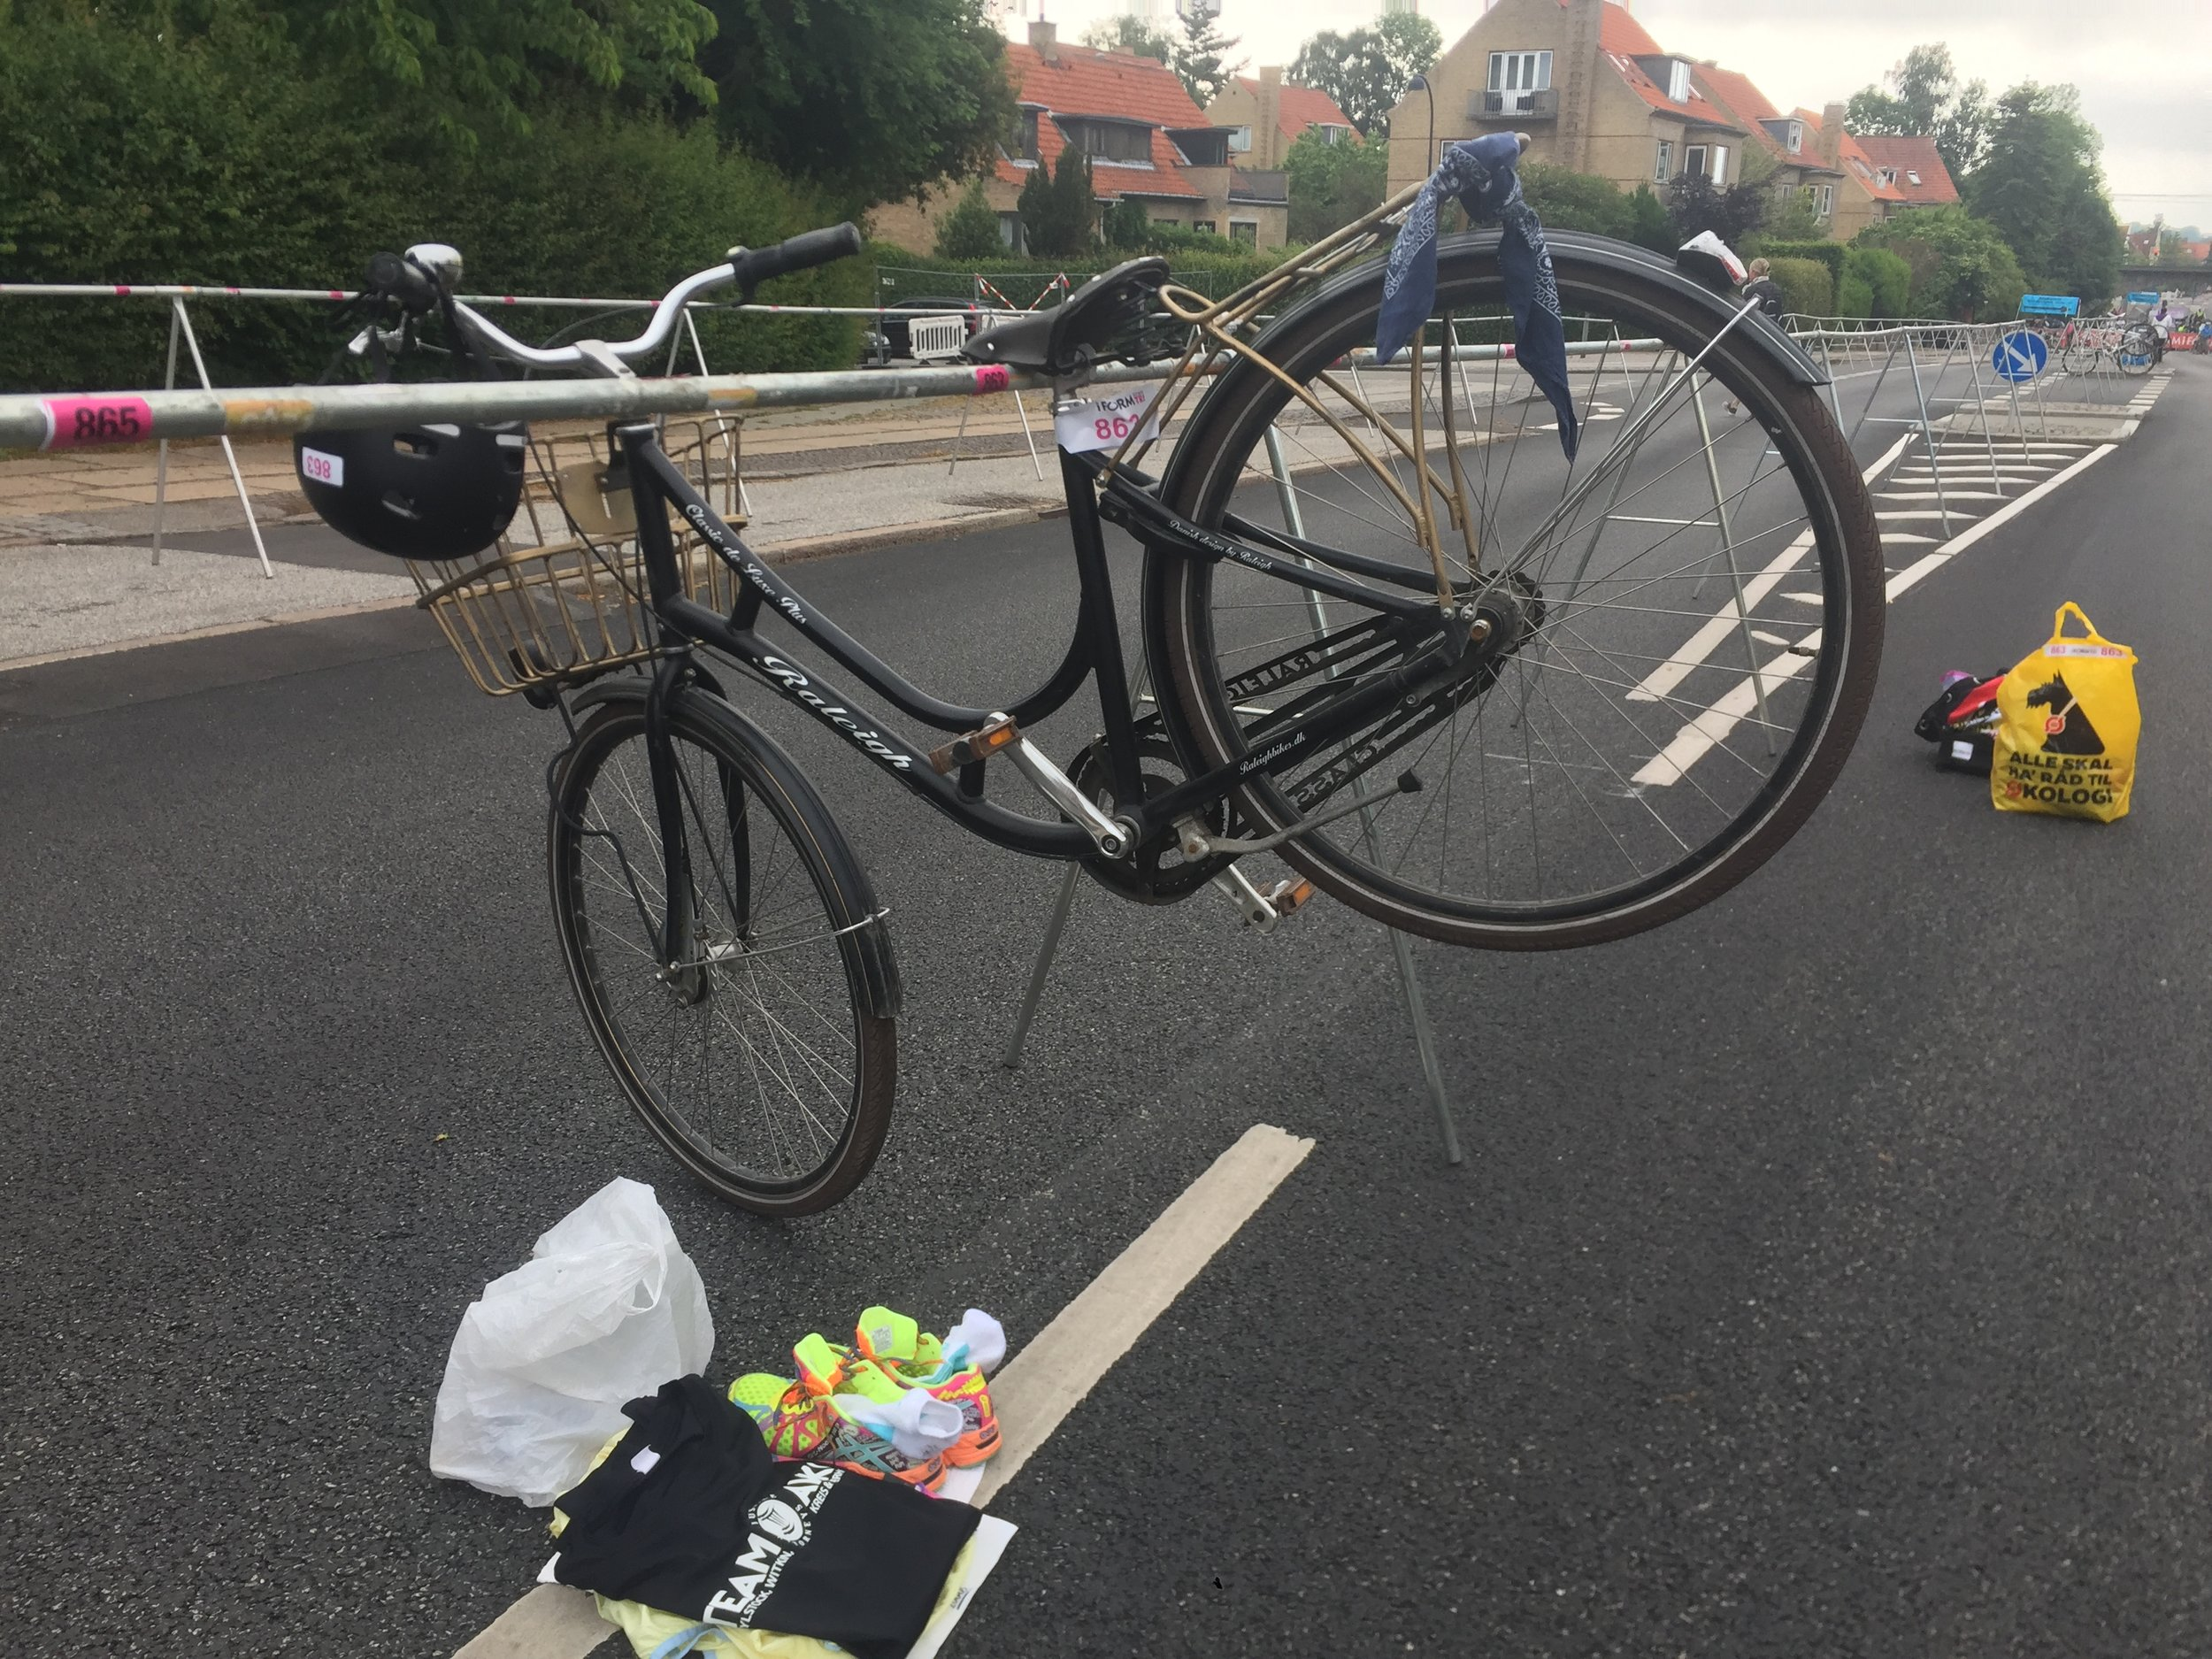 Heaviest bike on the course!